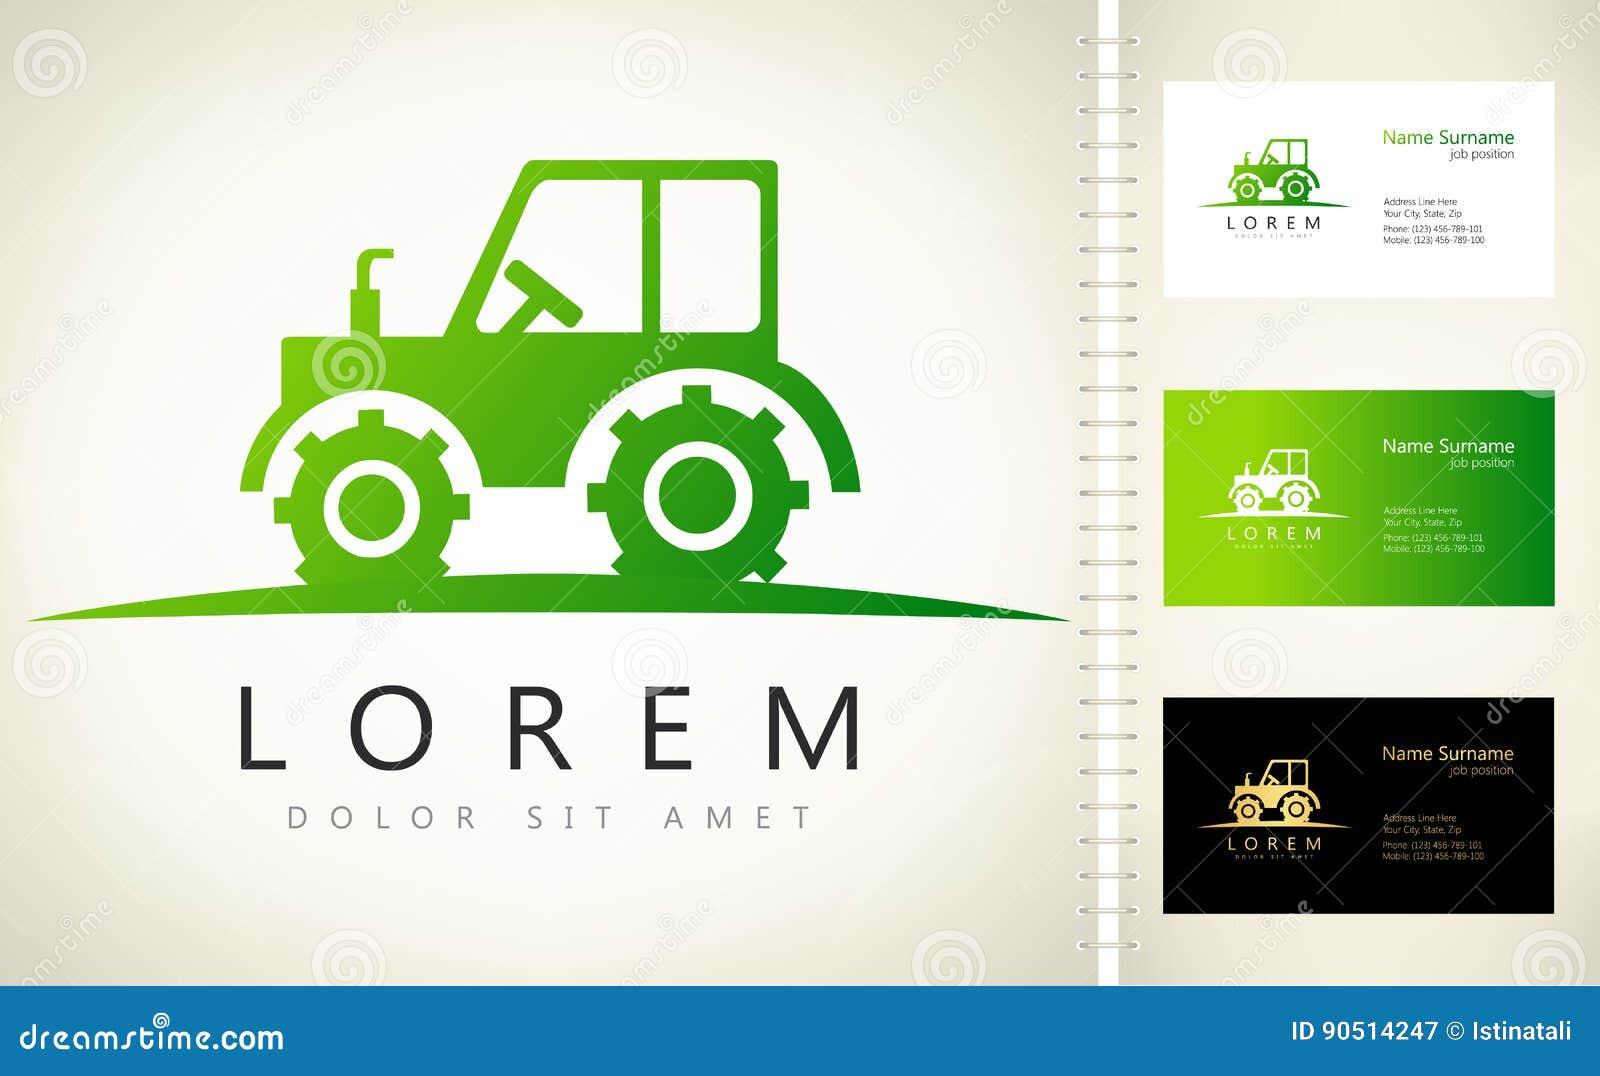 Tractor vector logo stock vector illustration of farm 90514247 download tractor vector logo stock vector illustration of farm 90514247 colourmoves